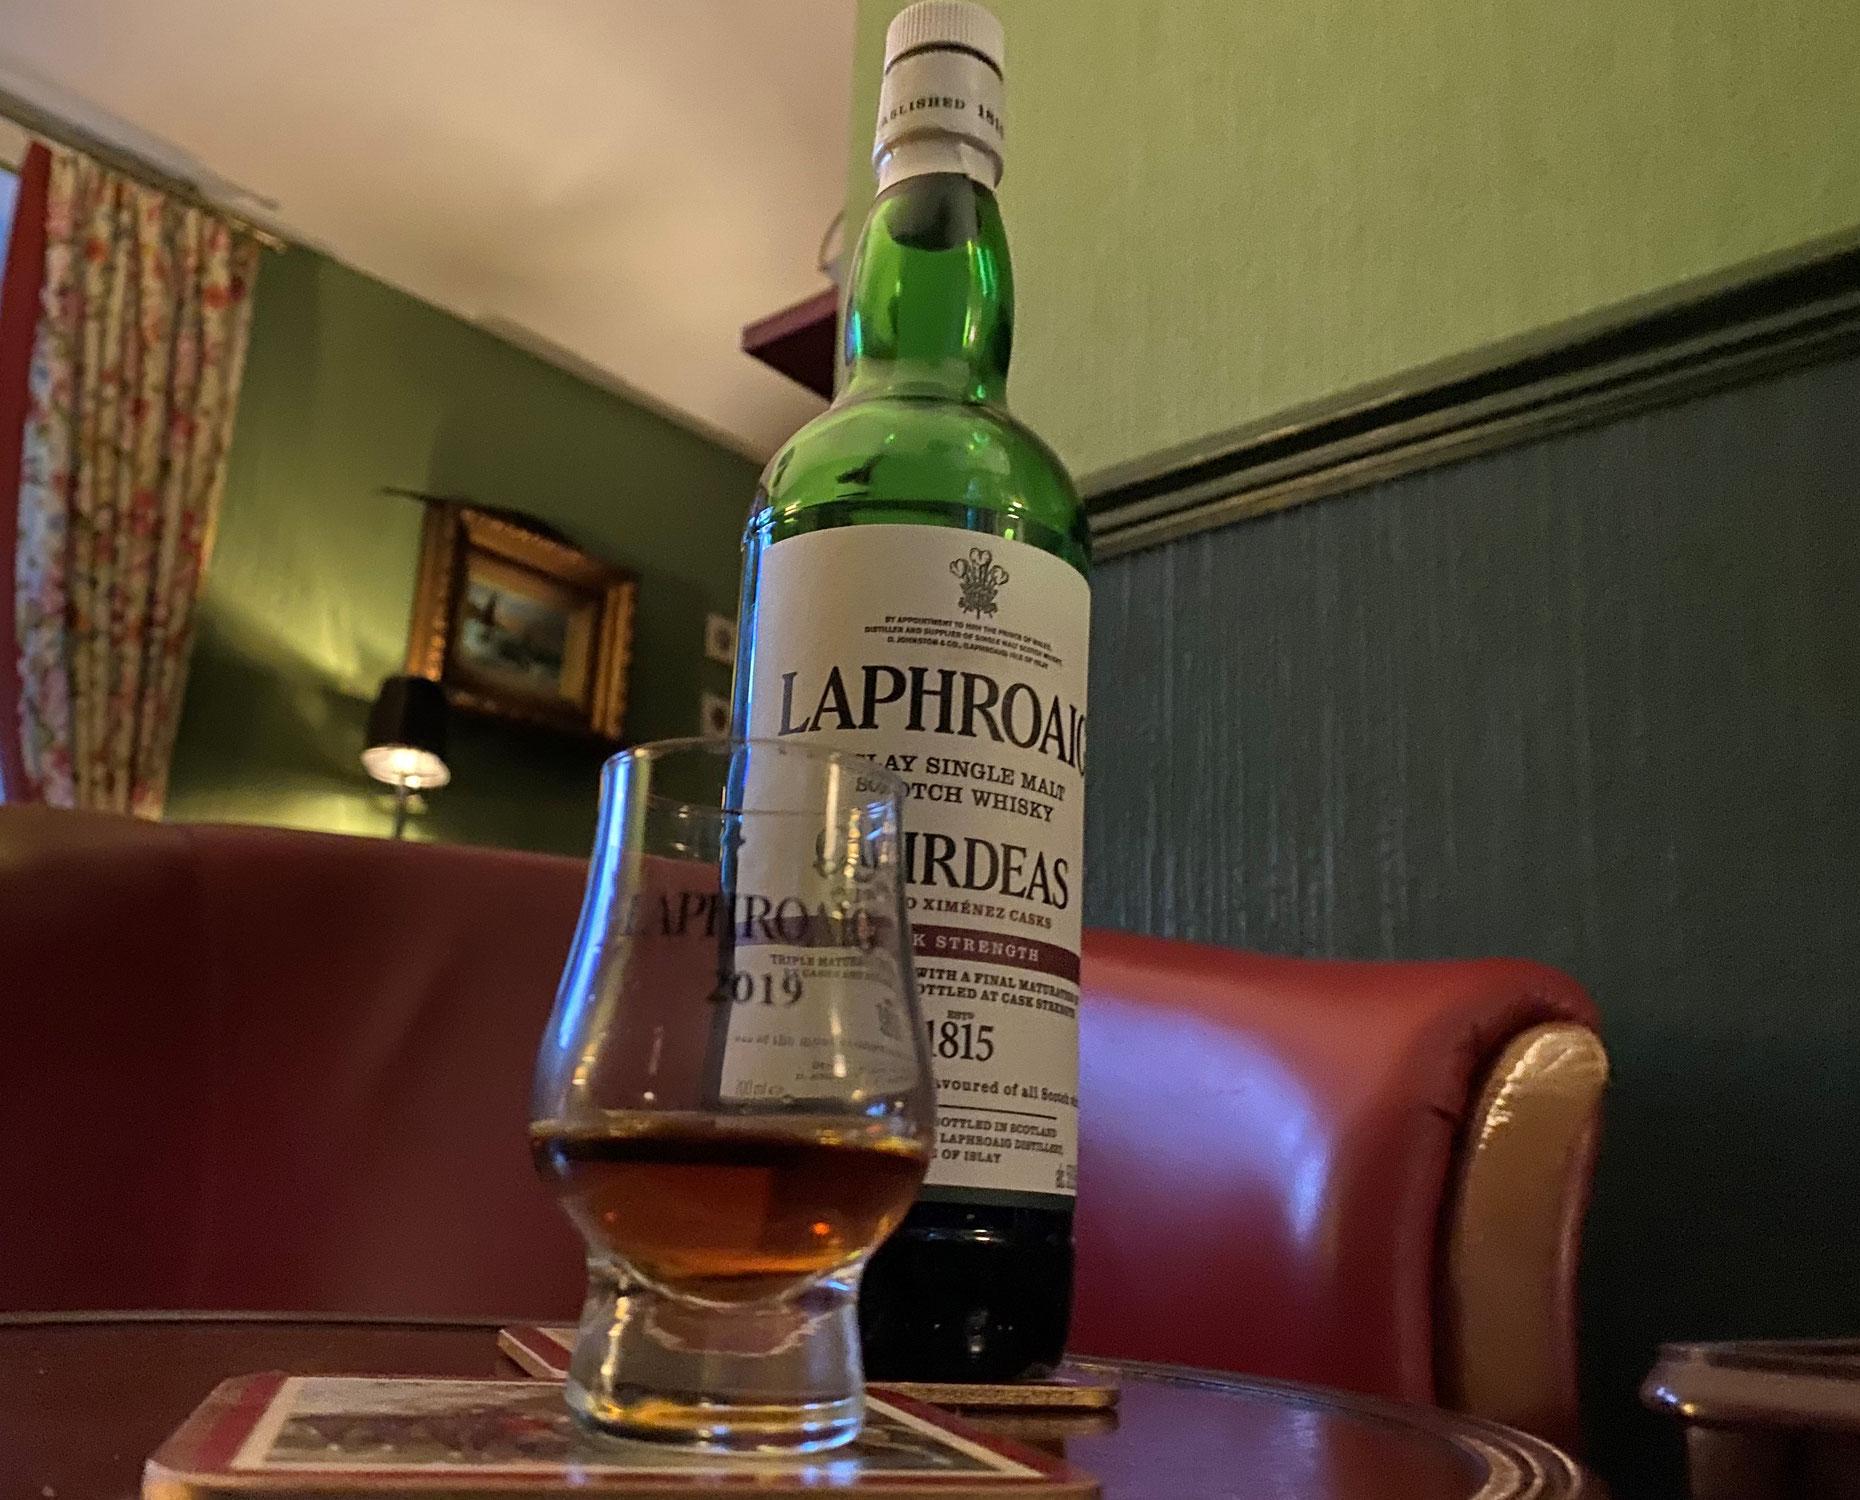 Tastingnotes: Laphroaig Cairdeas 2021 PX